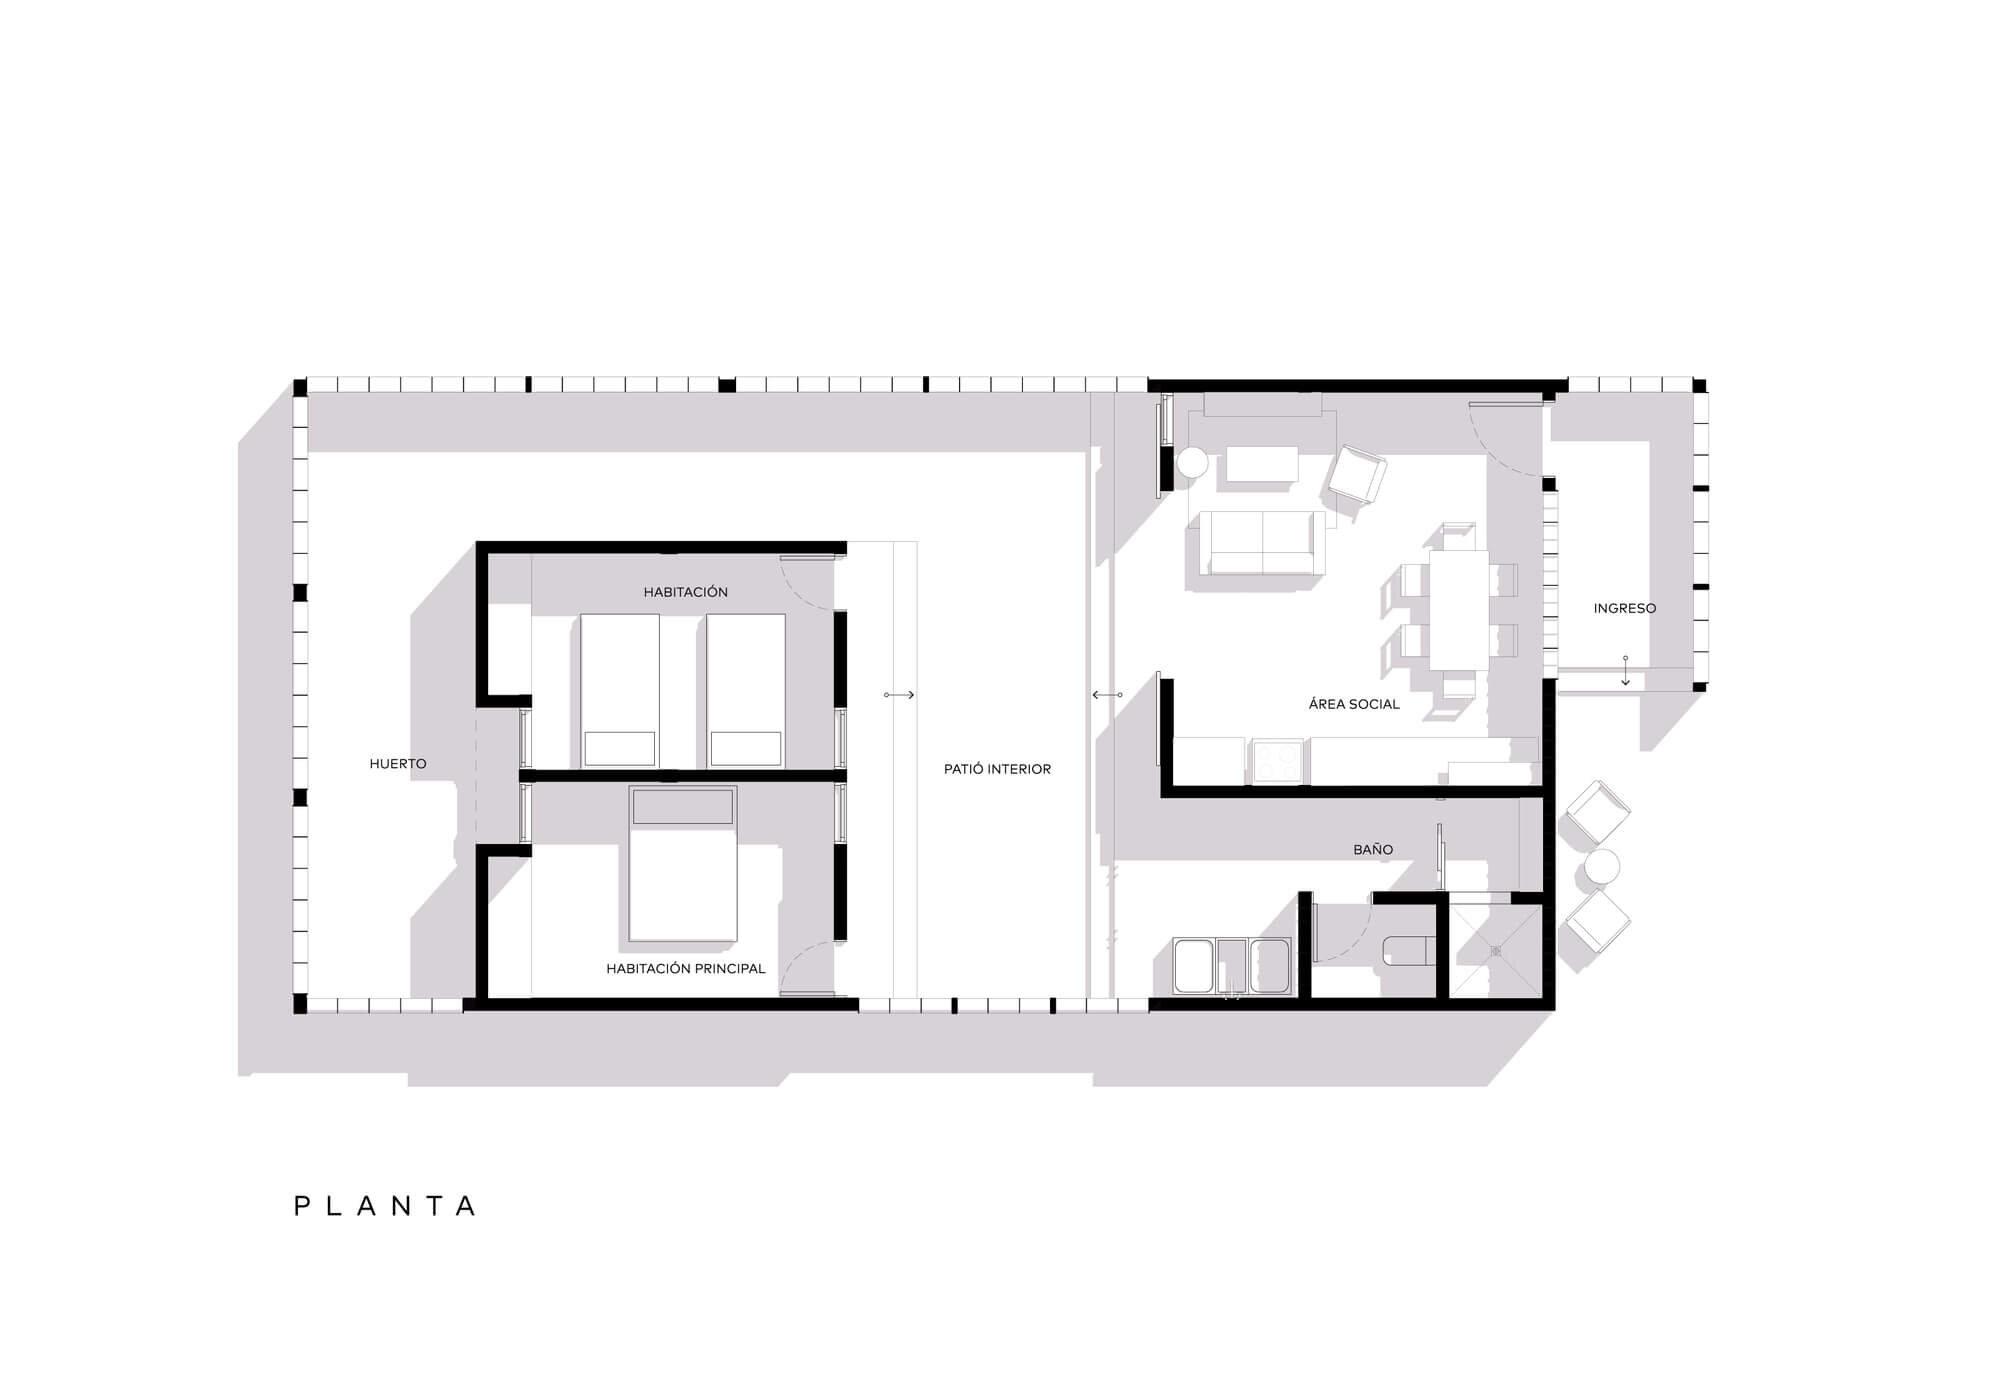 Plan-B-Guatemala-DEOC-Arquitectos-Guatemala-10